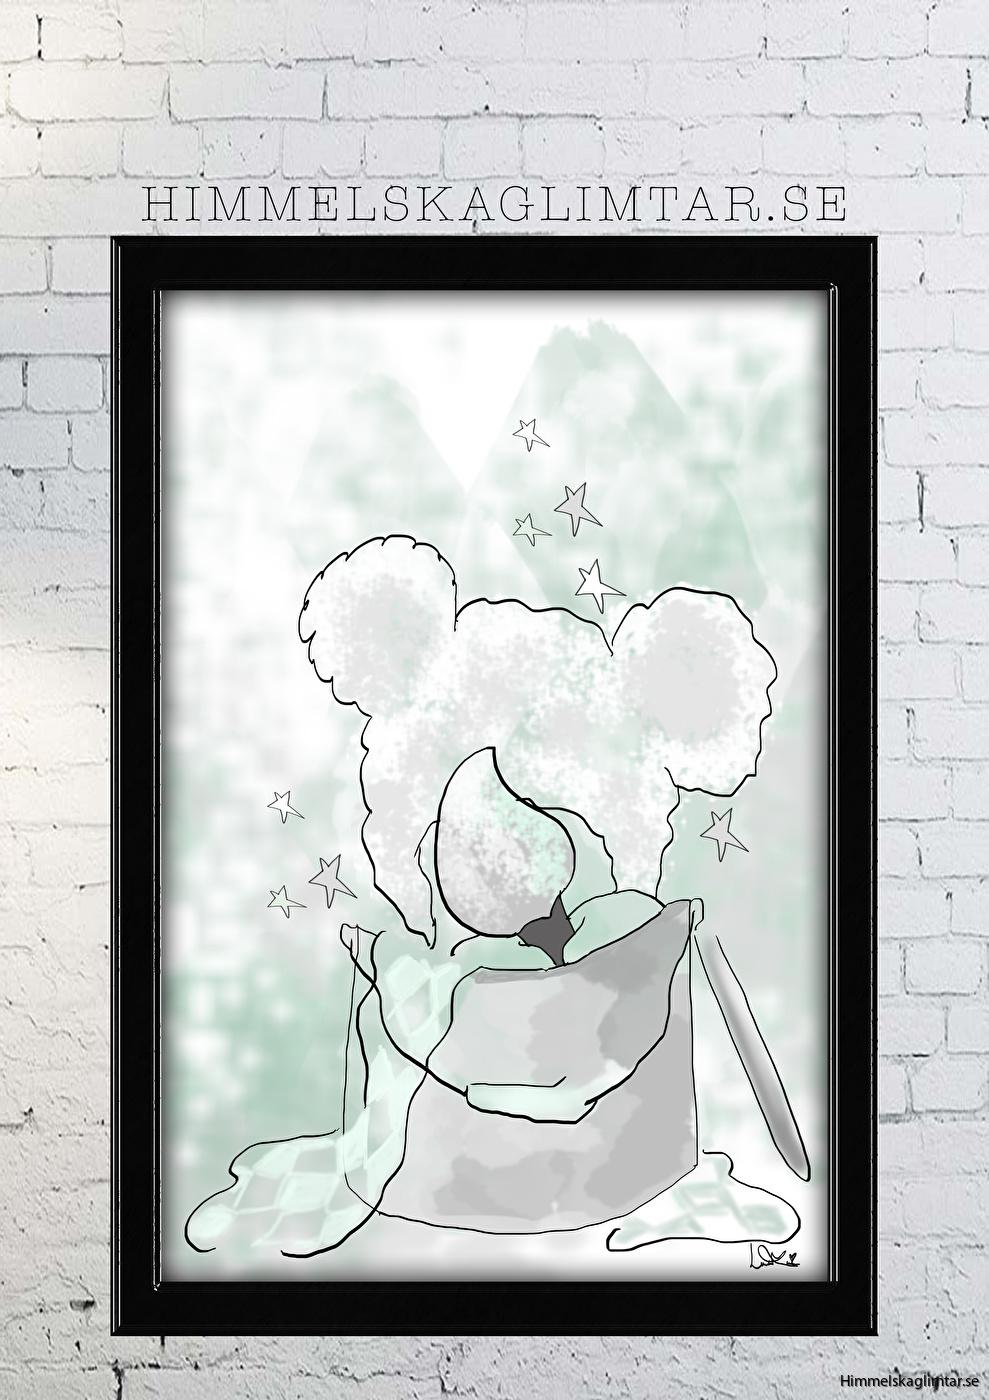 barnrum-barnrumsinredning-barnposter-poster-himmelskaglimtar-interior-pojke